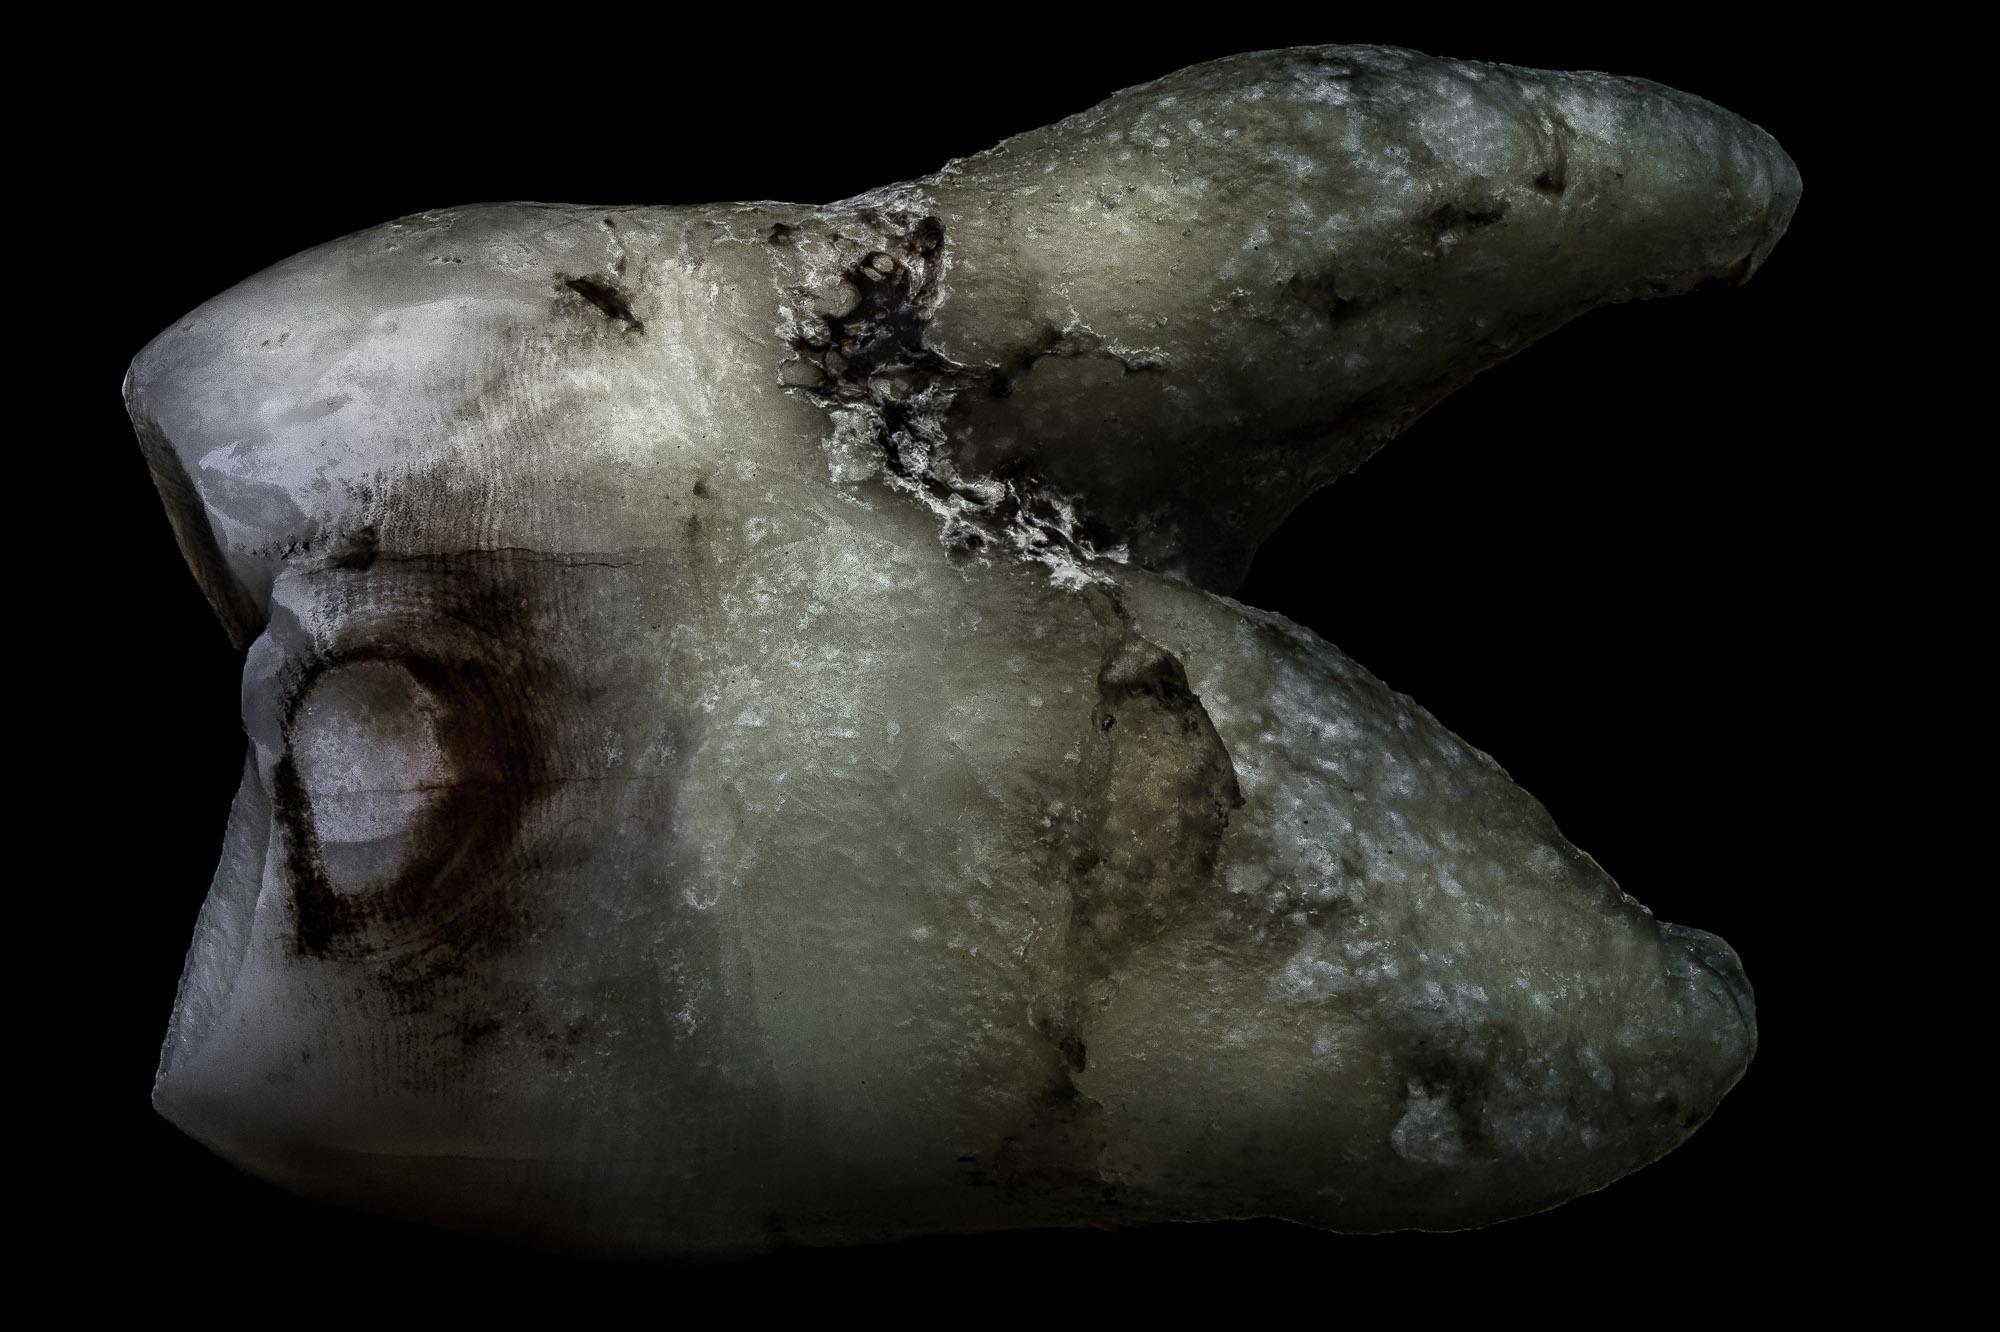 neal-auch-human-teeth-photographs-4.jpg